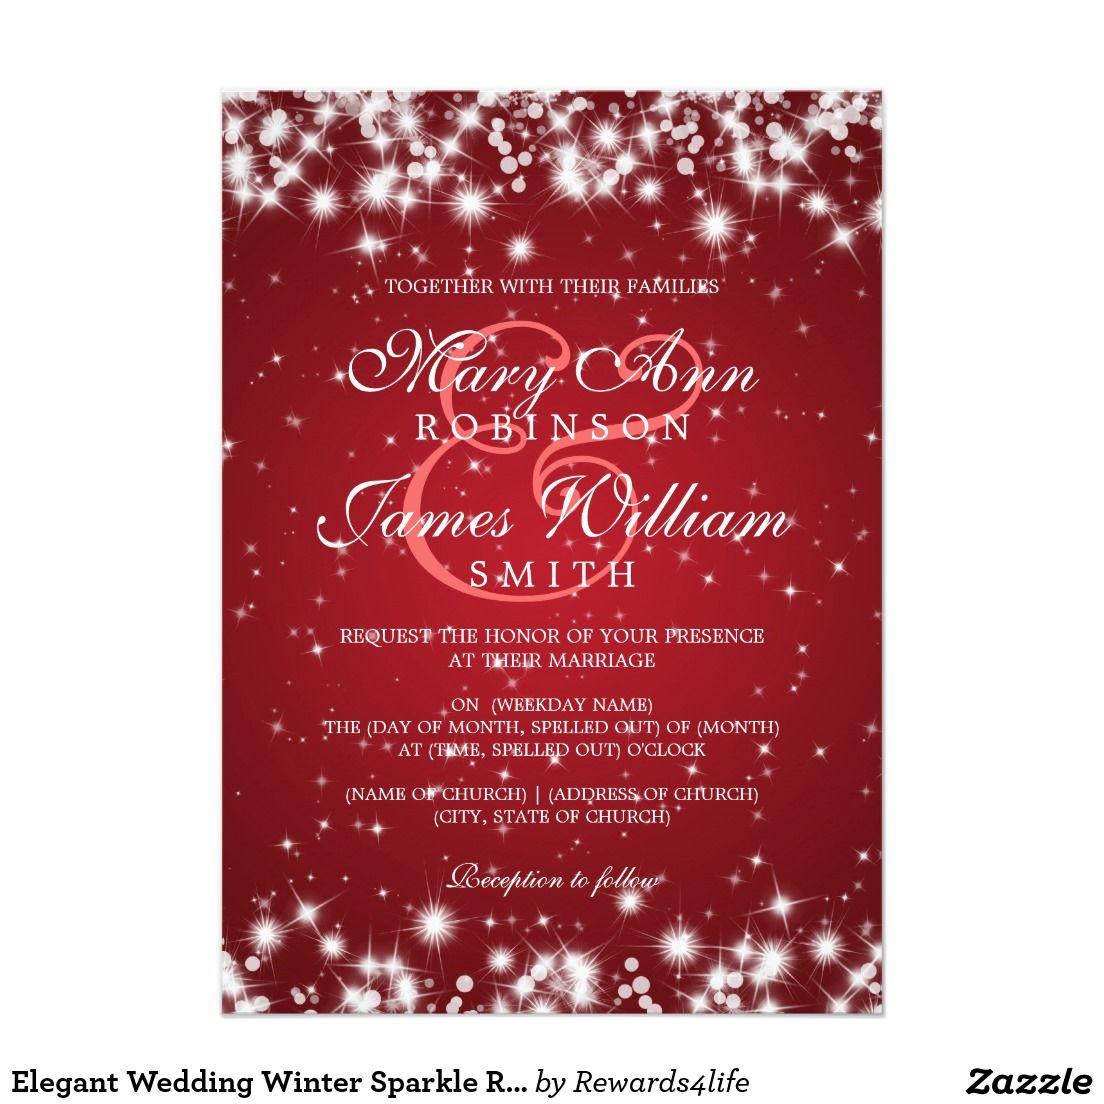 Elegant Wedding Winter Sparkle Red Card | The-Elegant-Wedding ...